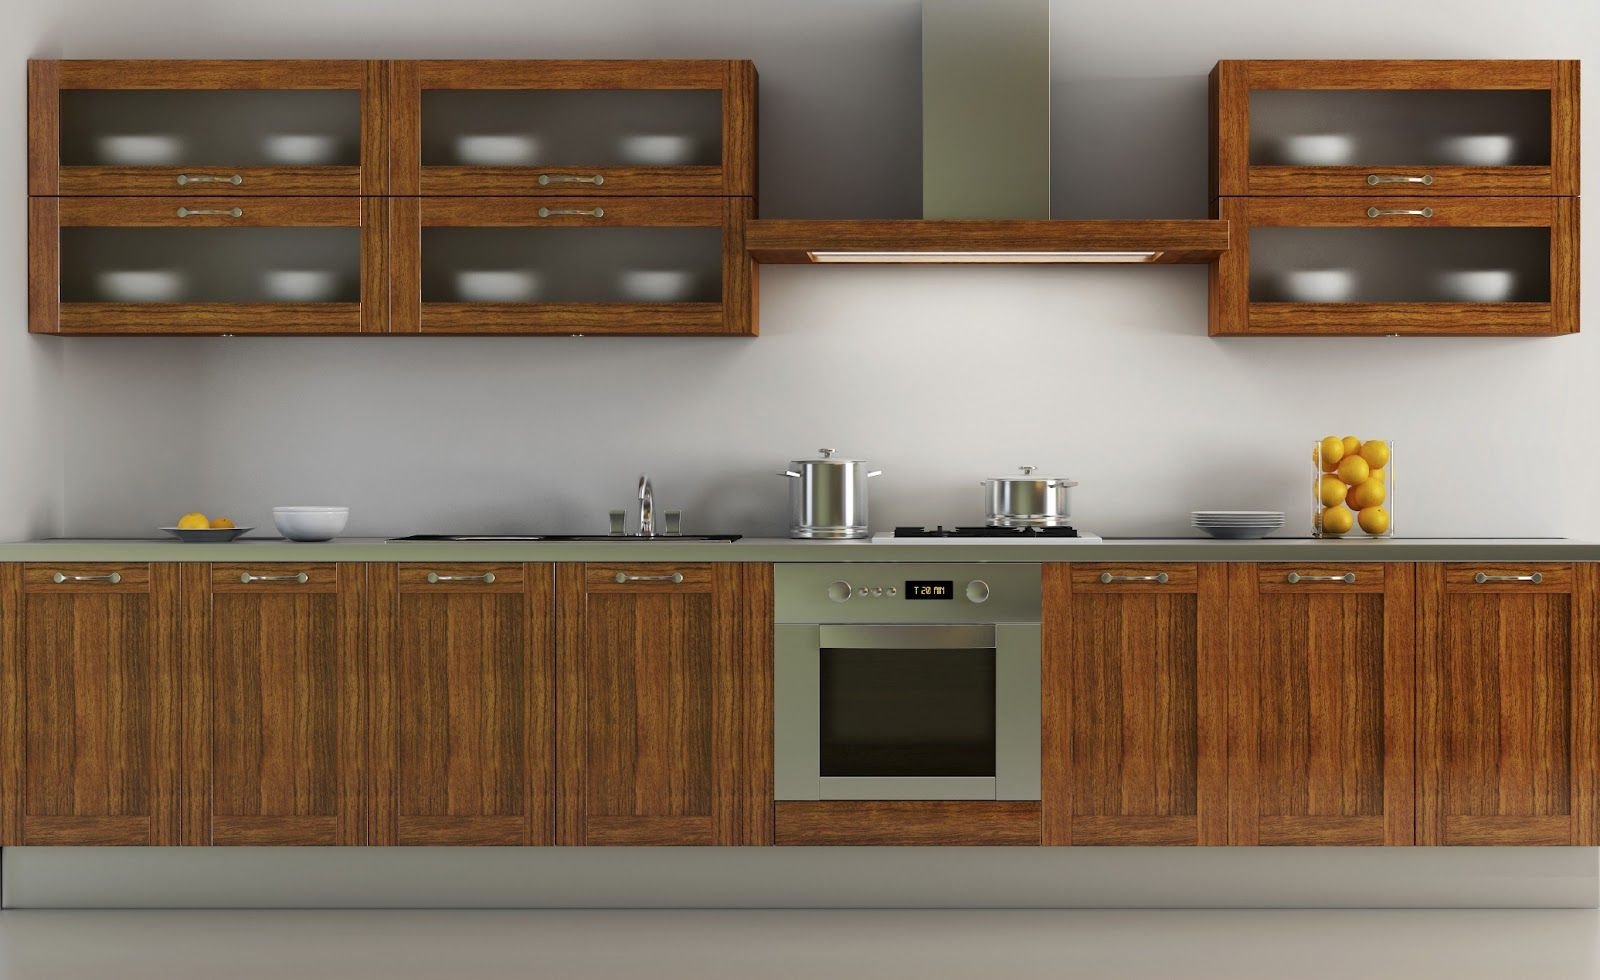 Kitchen wood pallet modern wood furniture idea for bathroom vanity